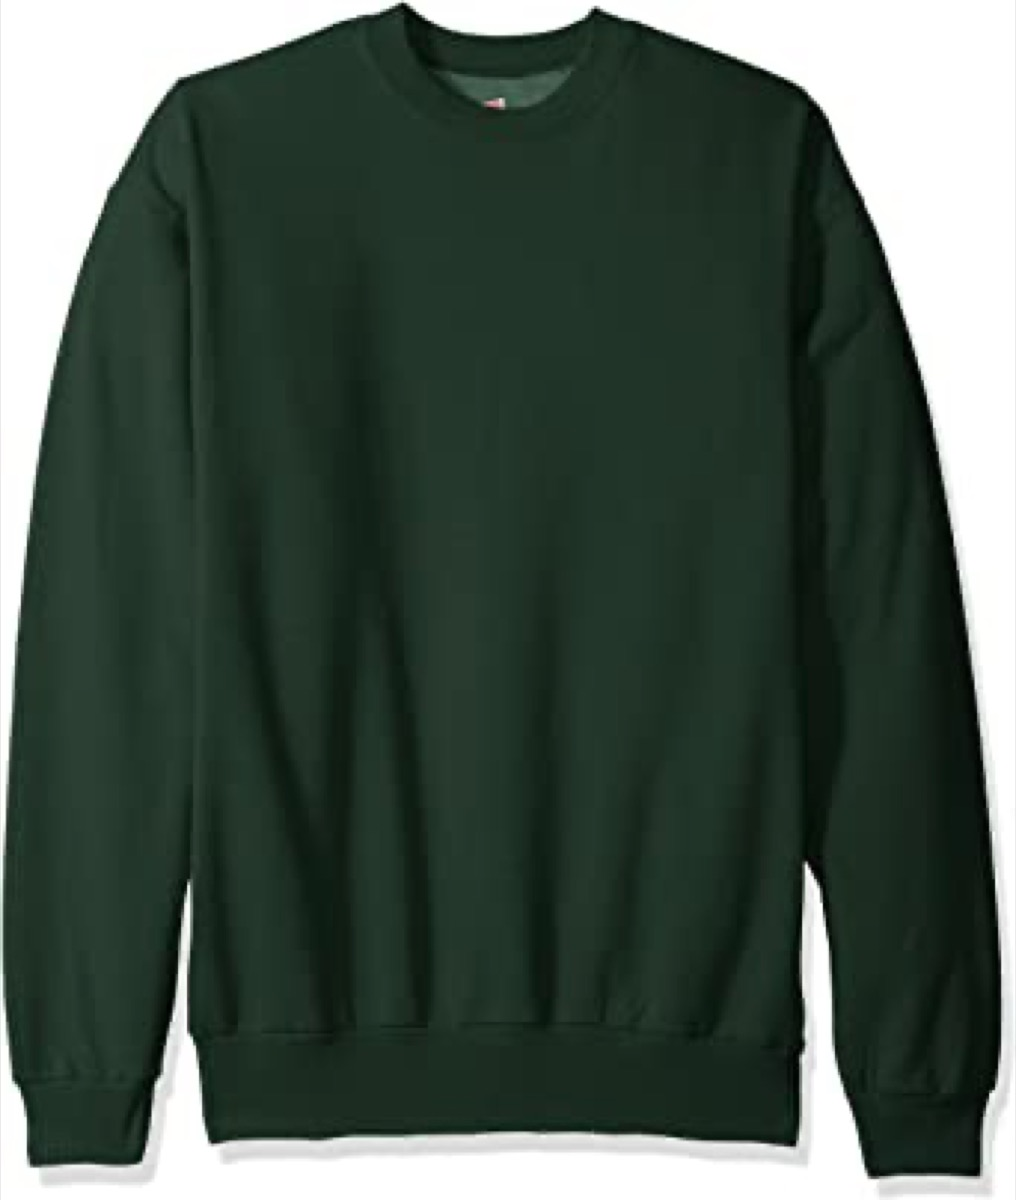 A green fleece crewneck sweatshirt